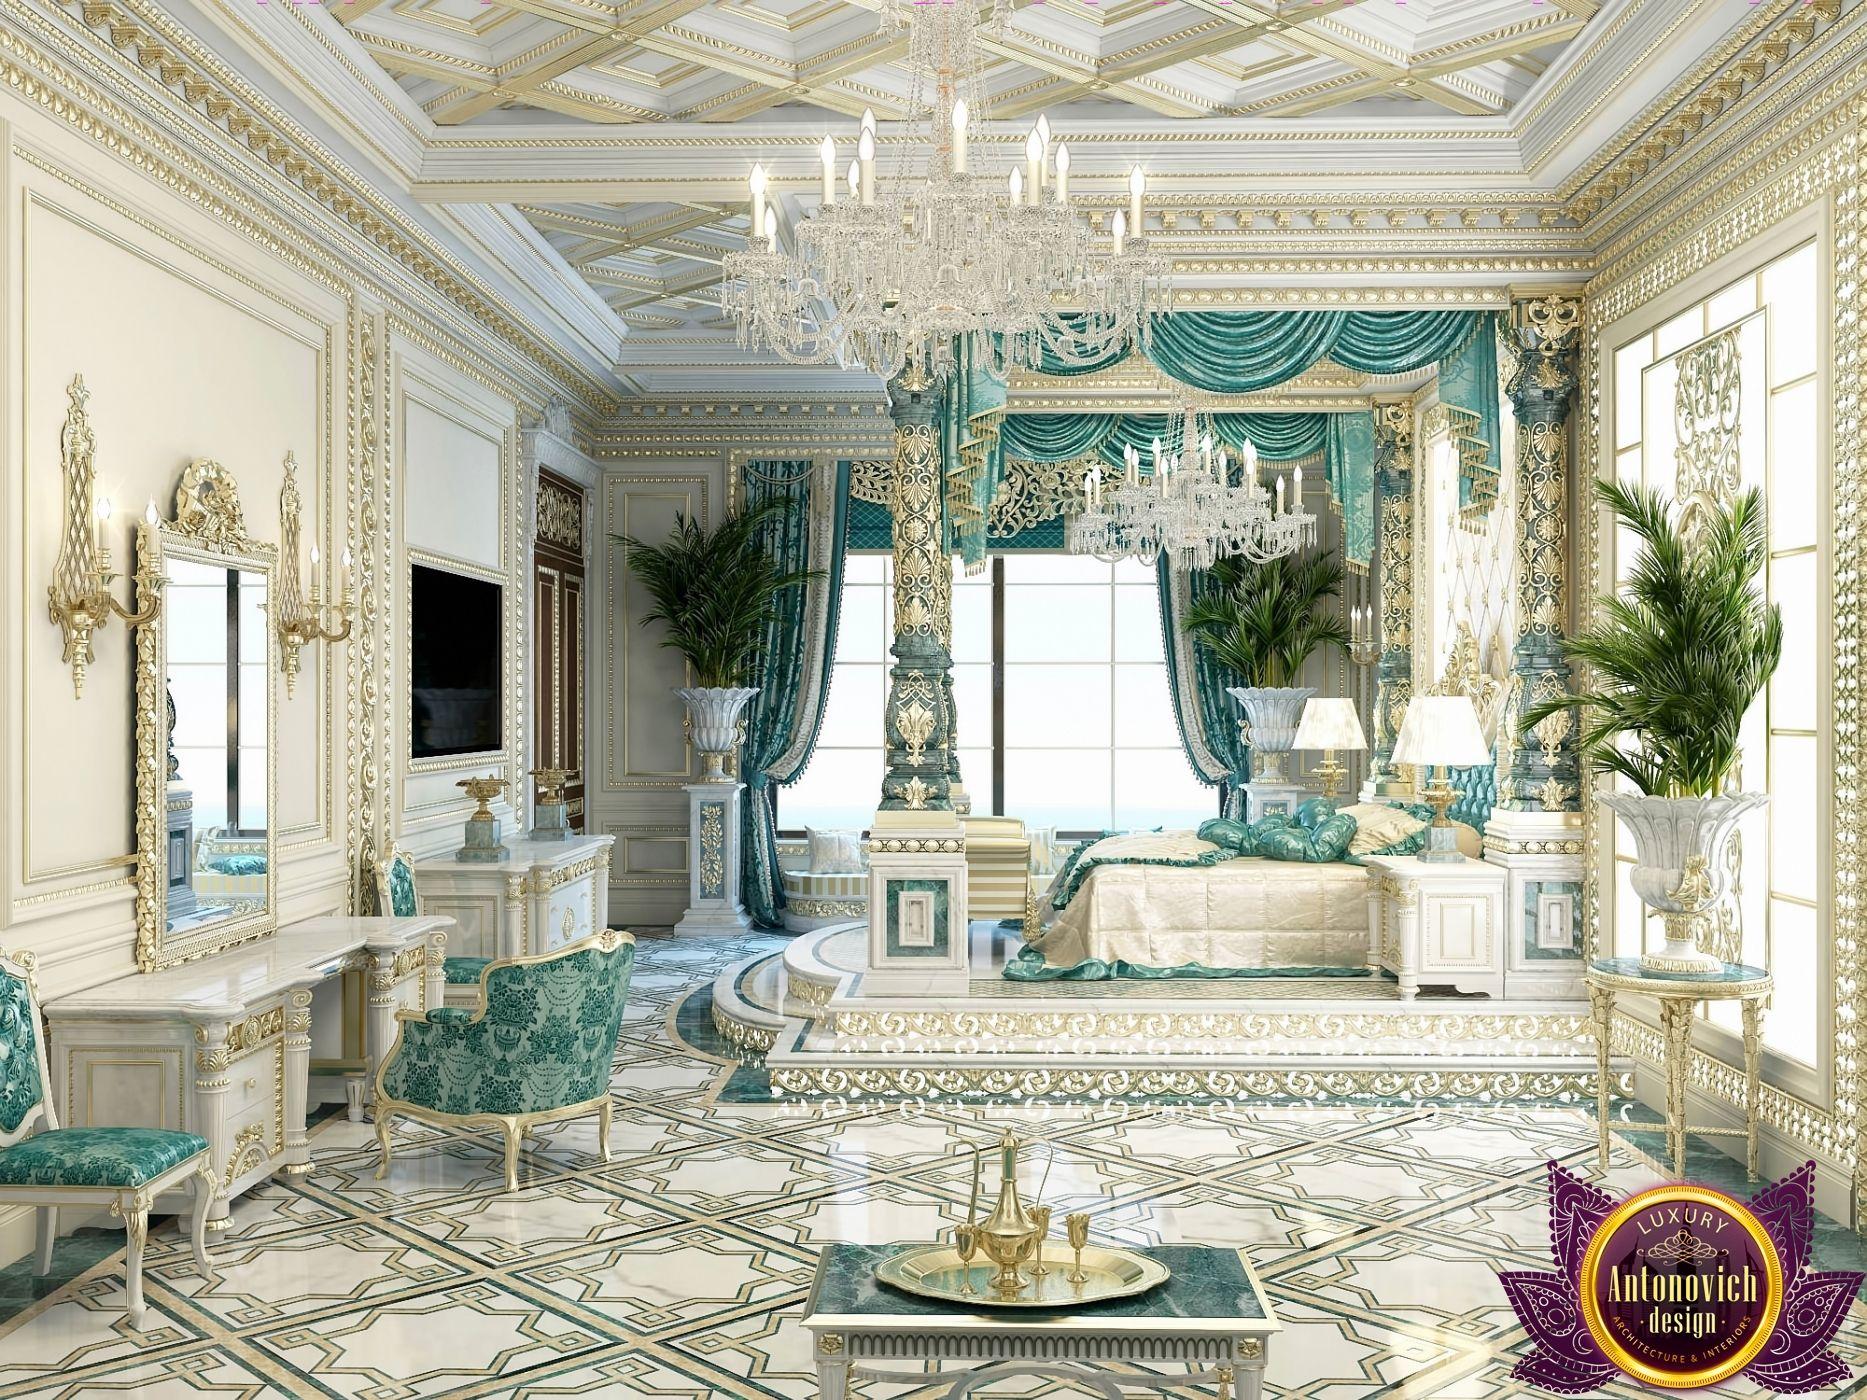 luxurious arabic style bedroom Bedroom Design in Dubai, luxury Royal Master bedroom design, Photo 1 | Arabic | Master Bedroom